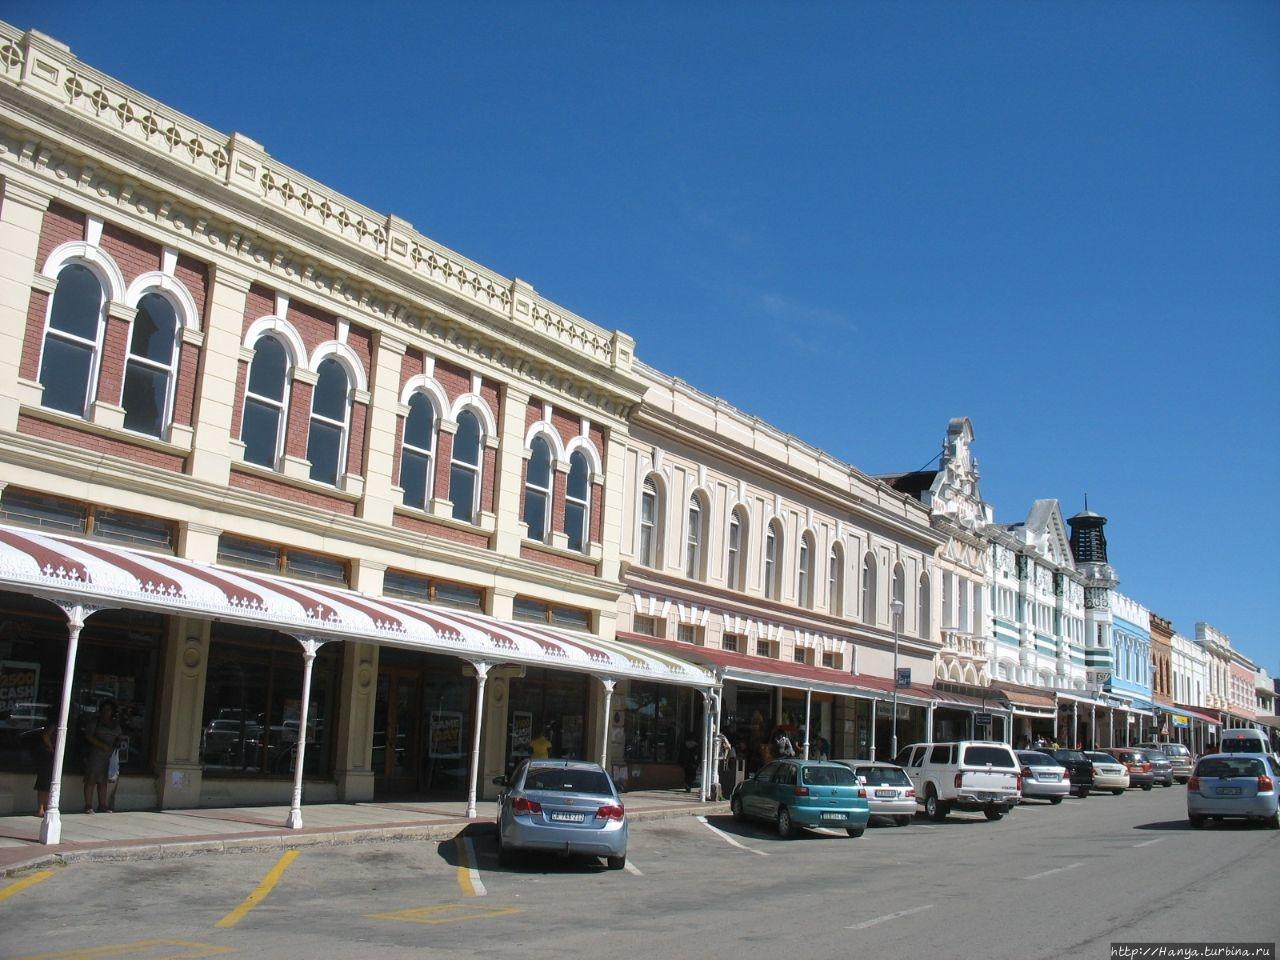 Улица Хай-стрит и ее здания Грэхэмстаун, ЮАР